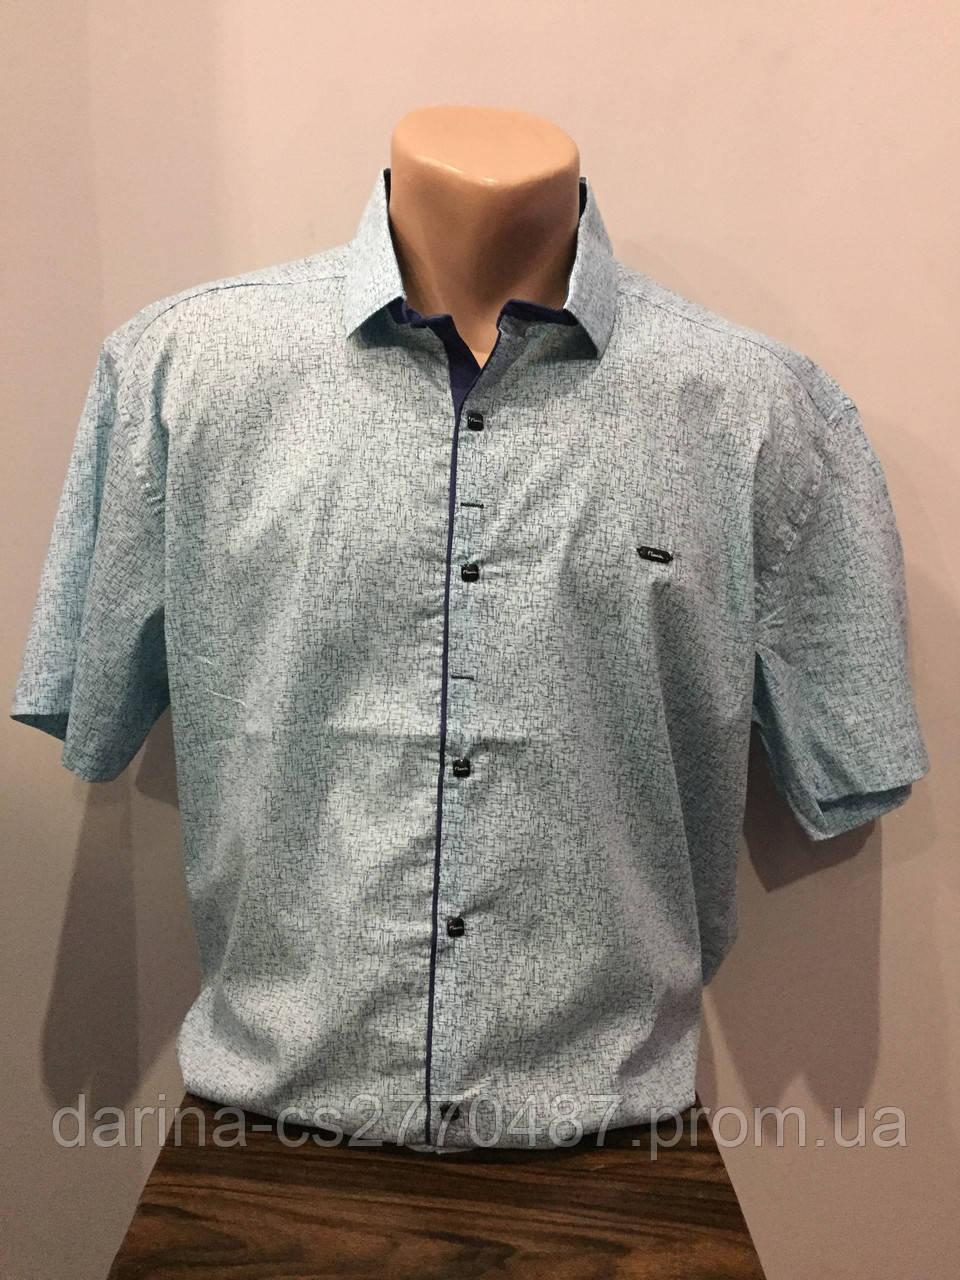 Мужская рубашка батал с коротким рукавом 4XL,5XL